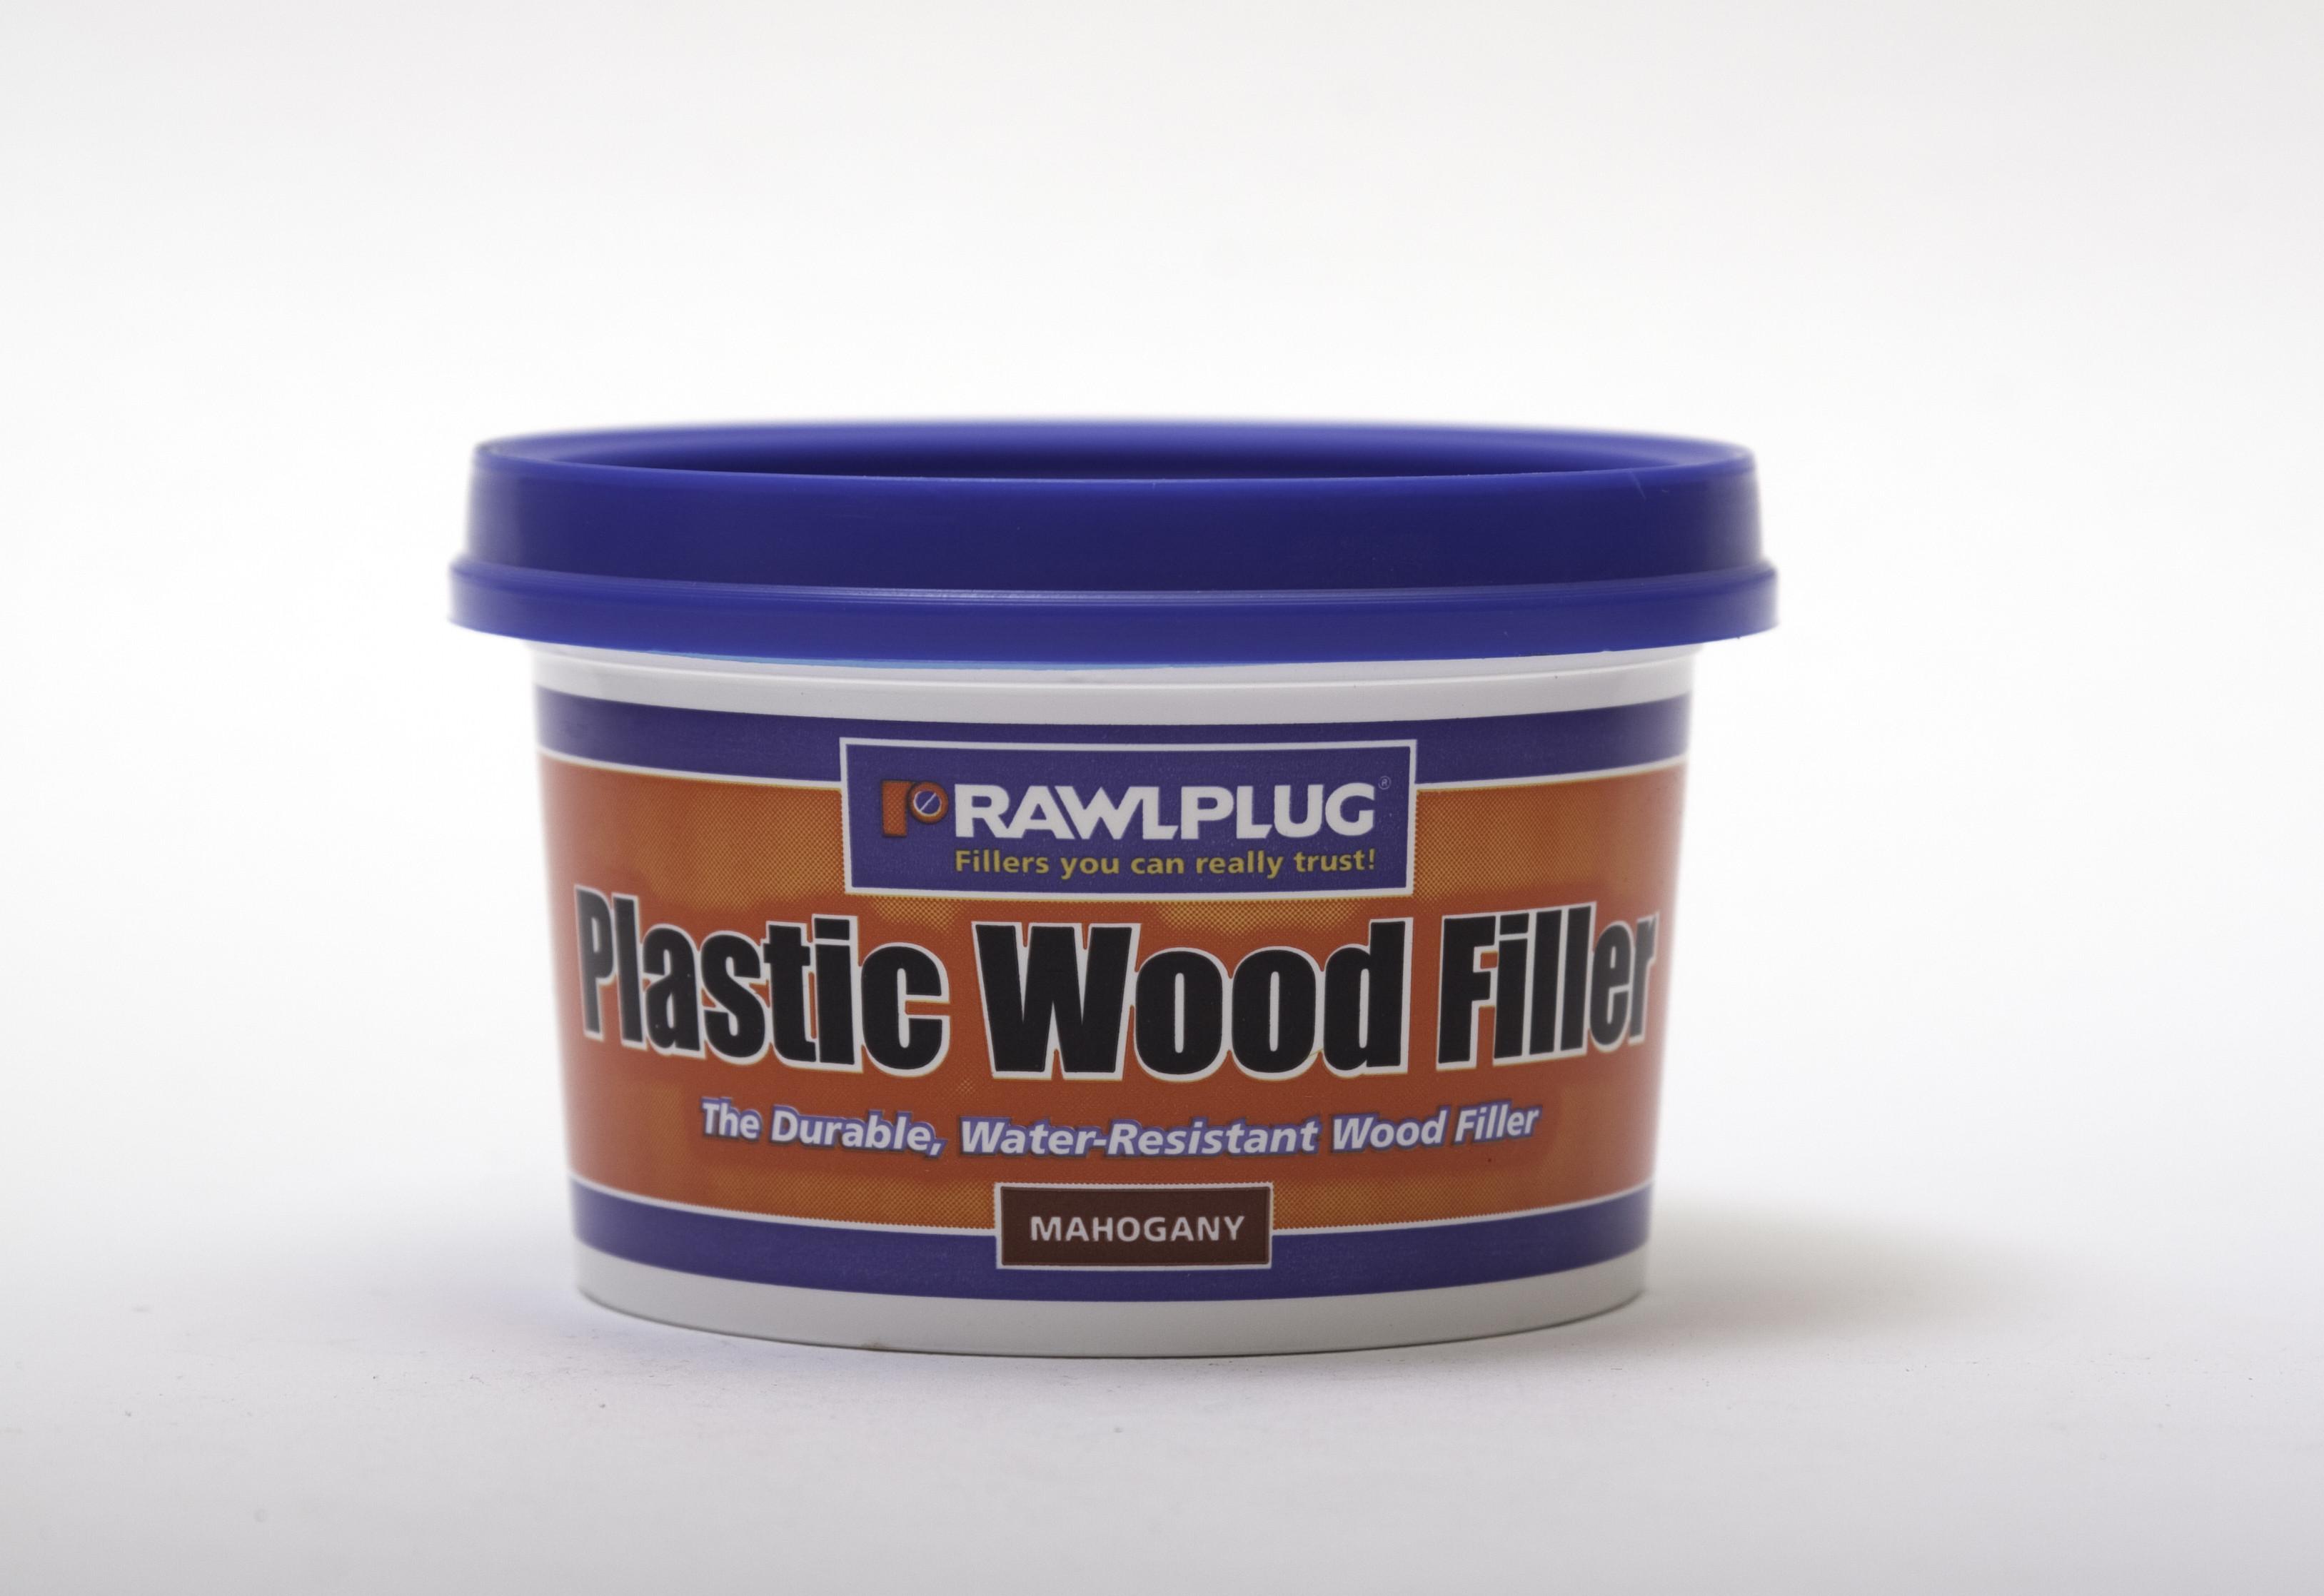 Rawlplug Plastic Wood Filler 250ml Mahogany